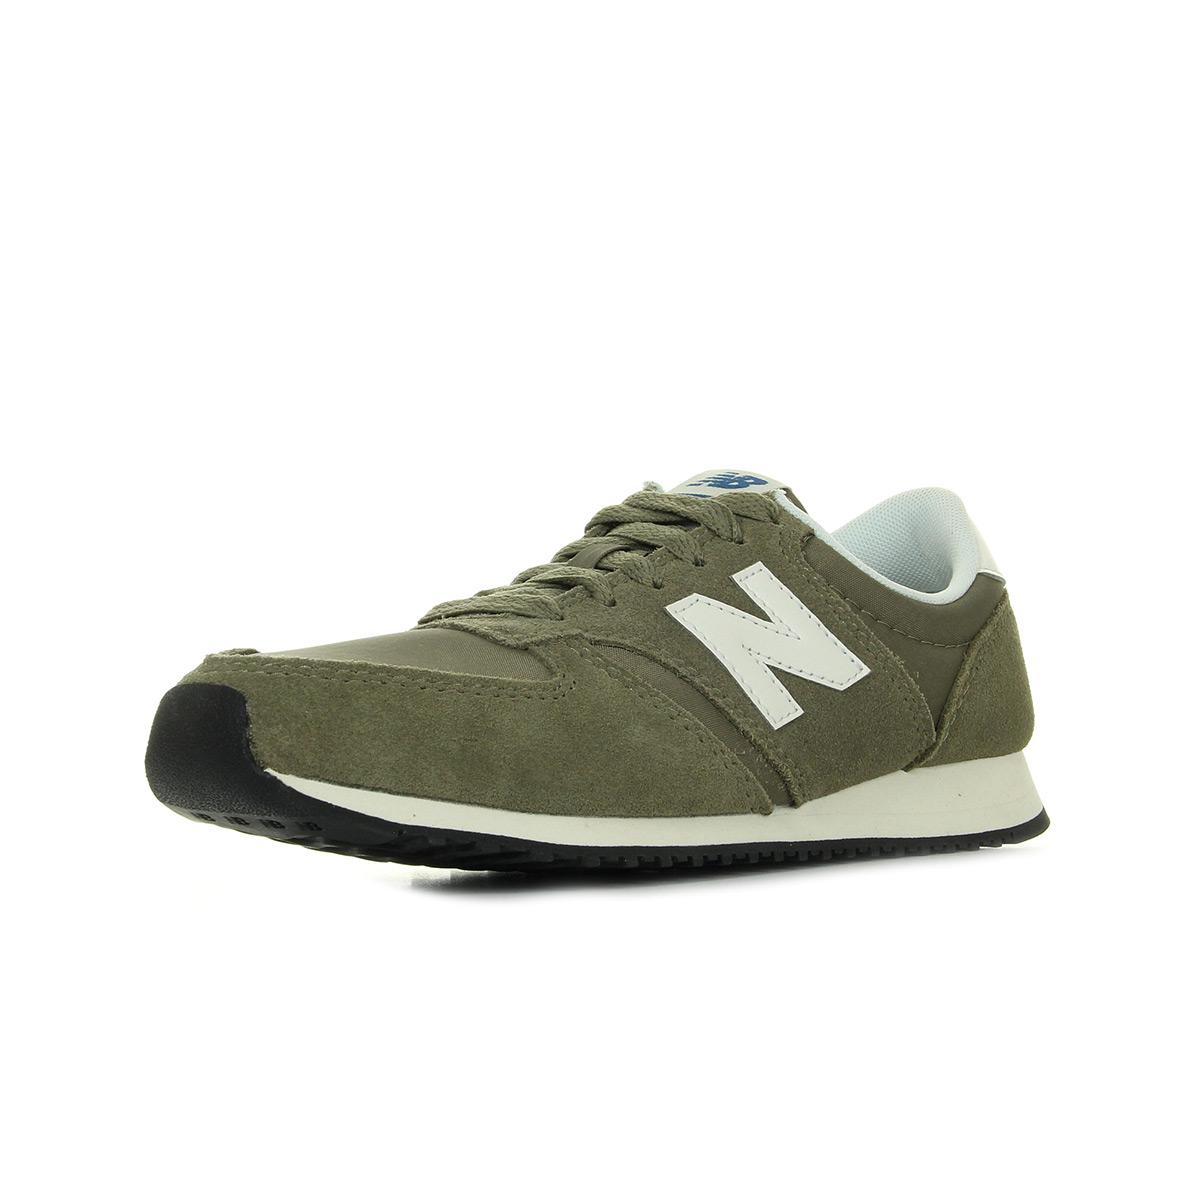 Chaussures Vente New Balance Achat Homme wwTYaf